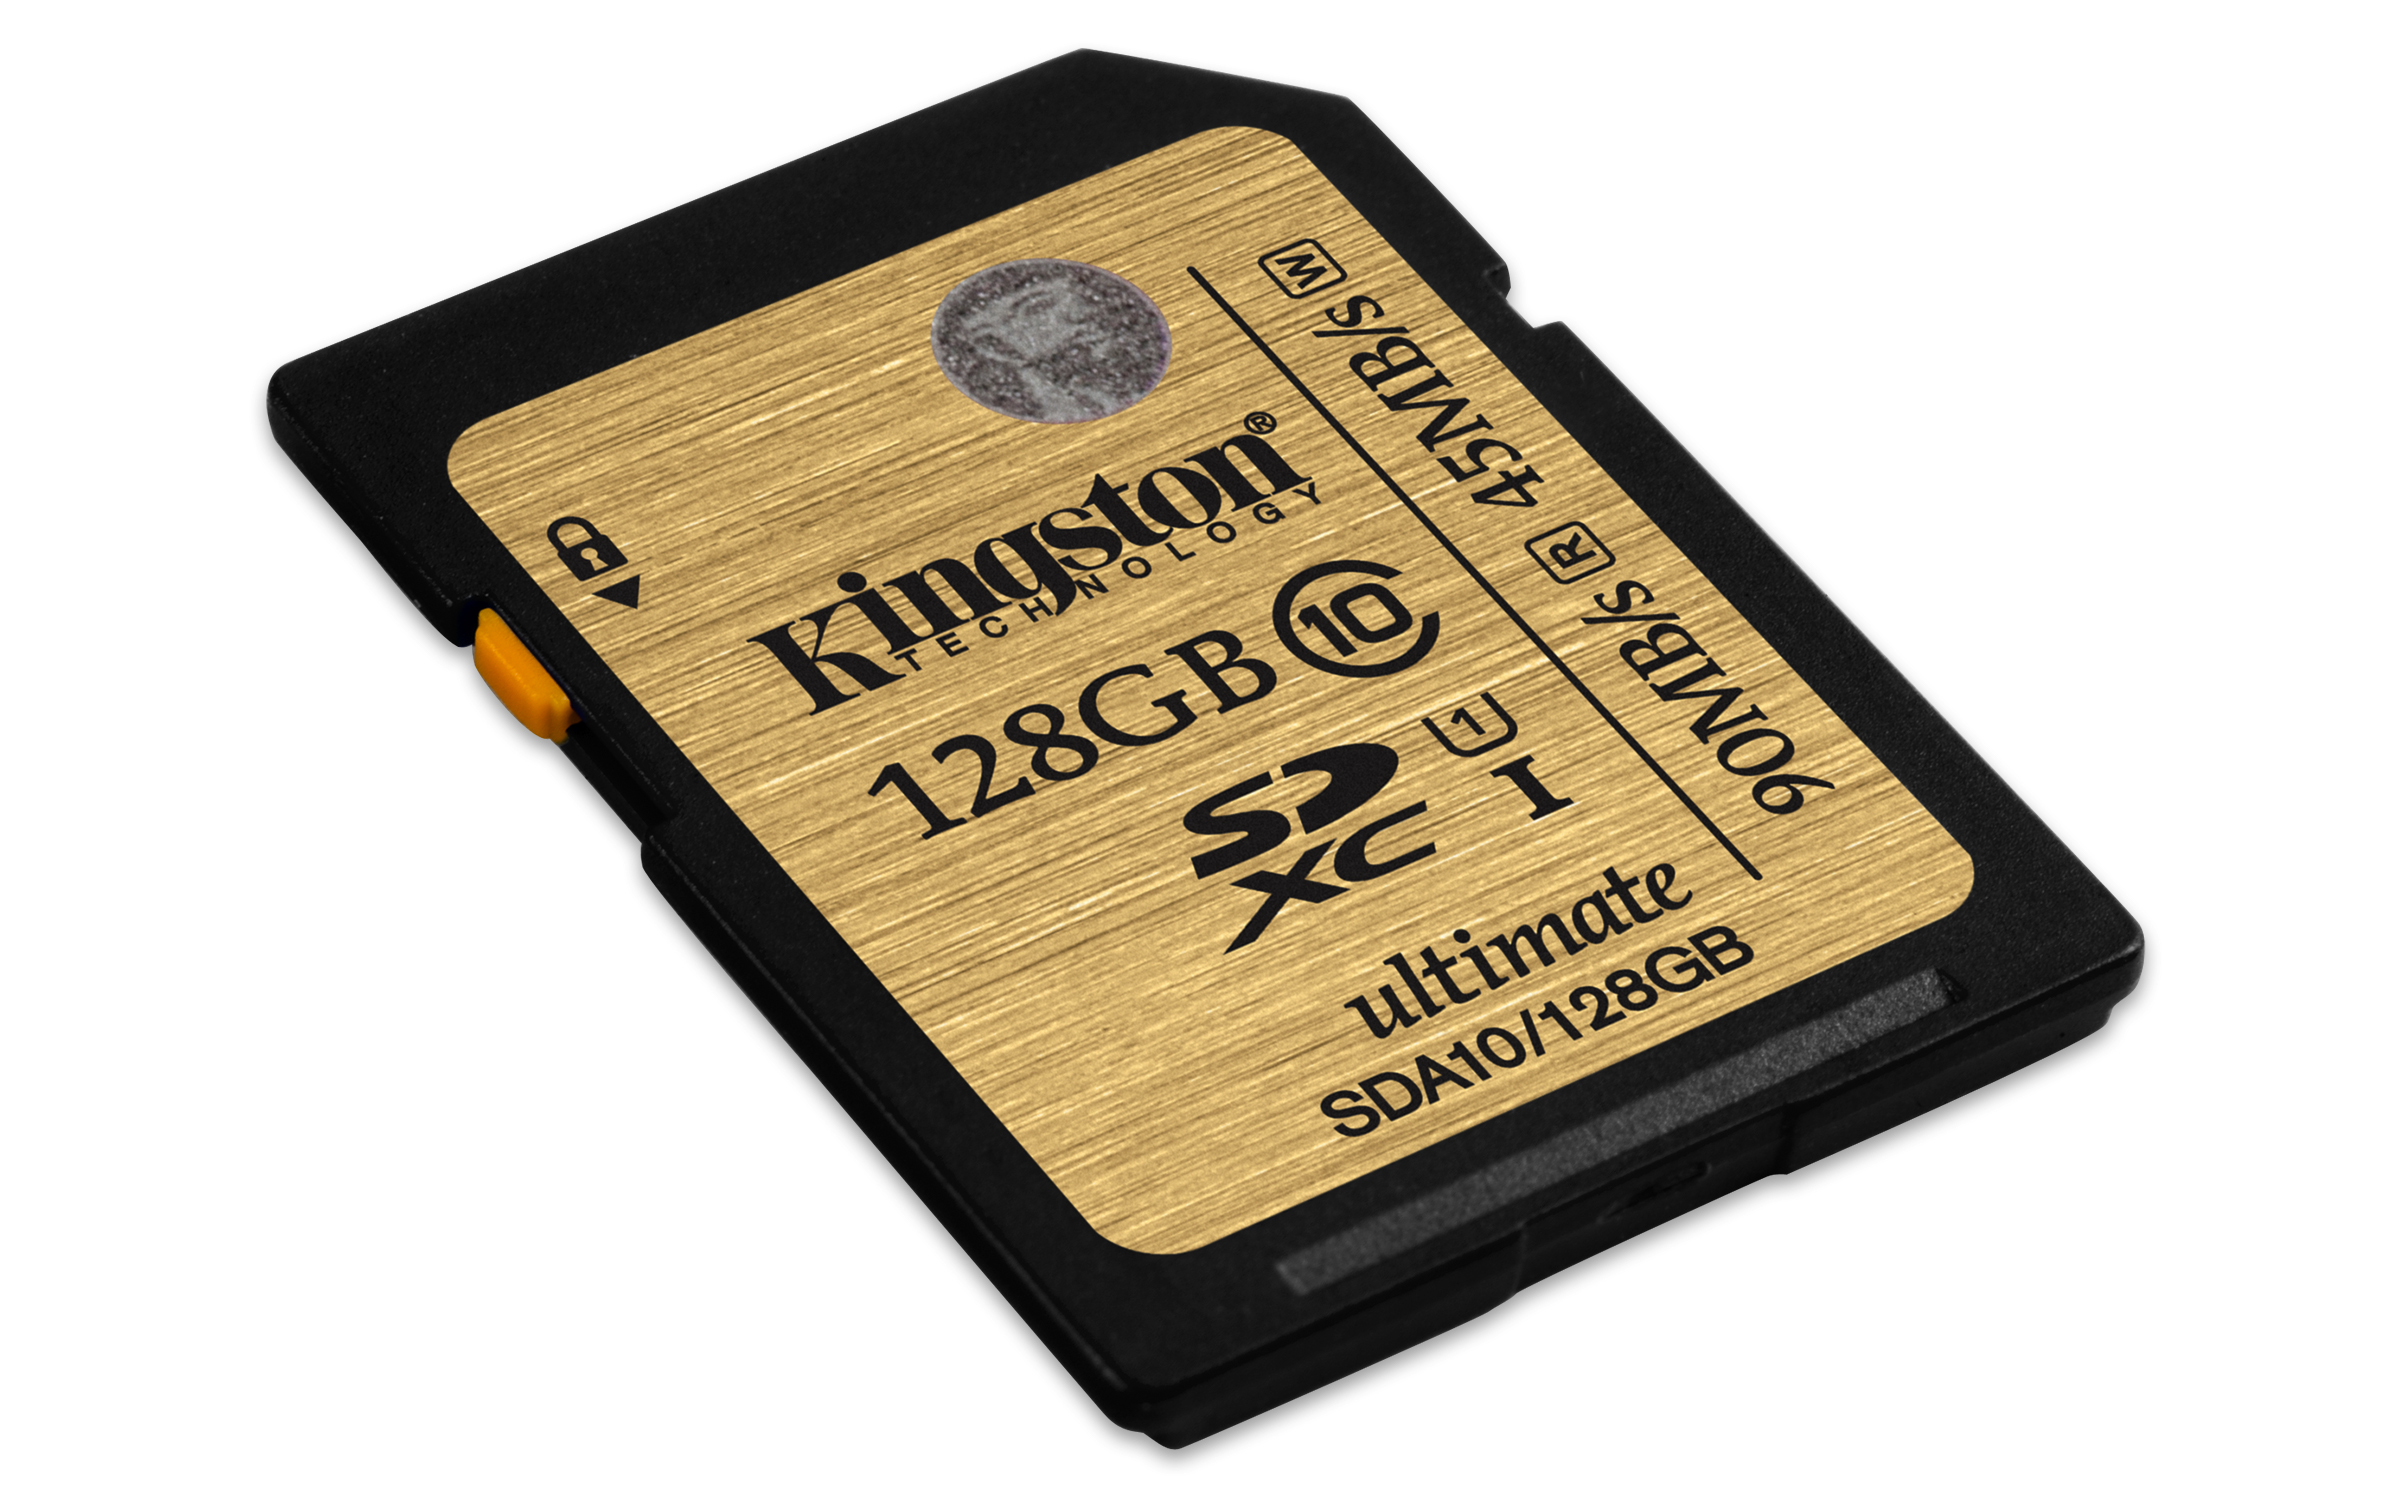 128GB SDXC Ultimate UHS-I Kingston class 10